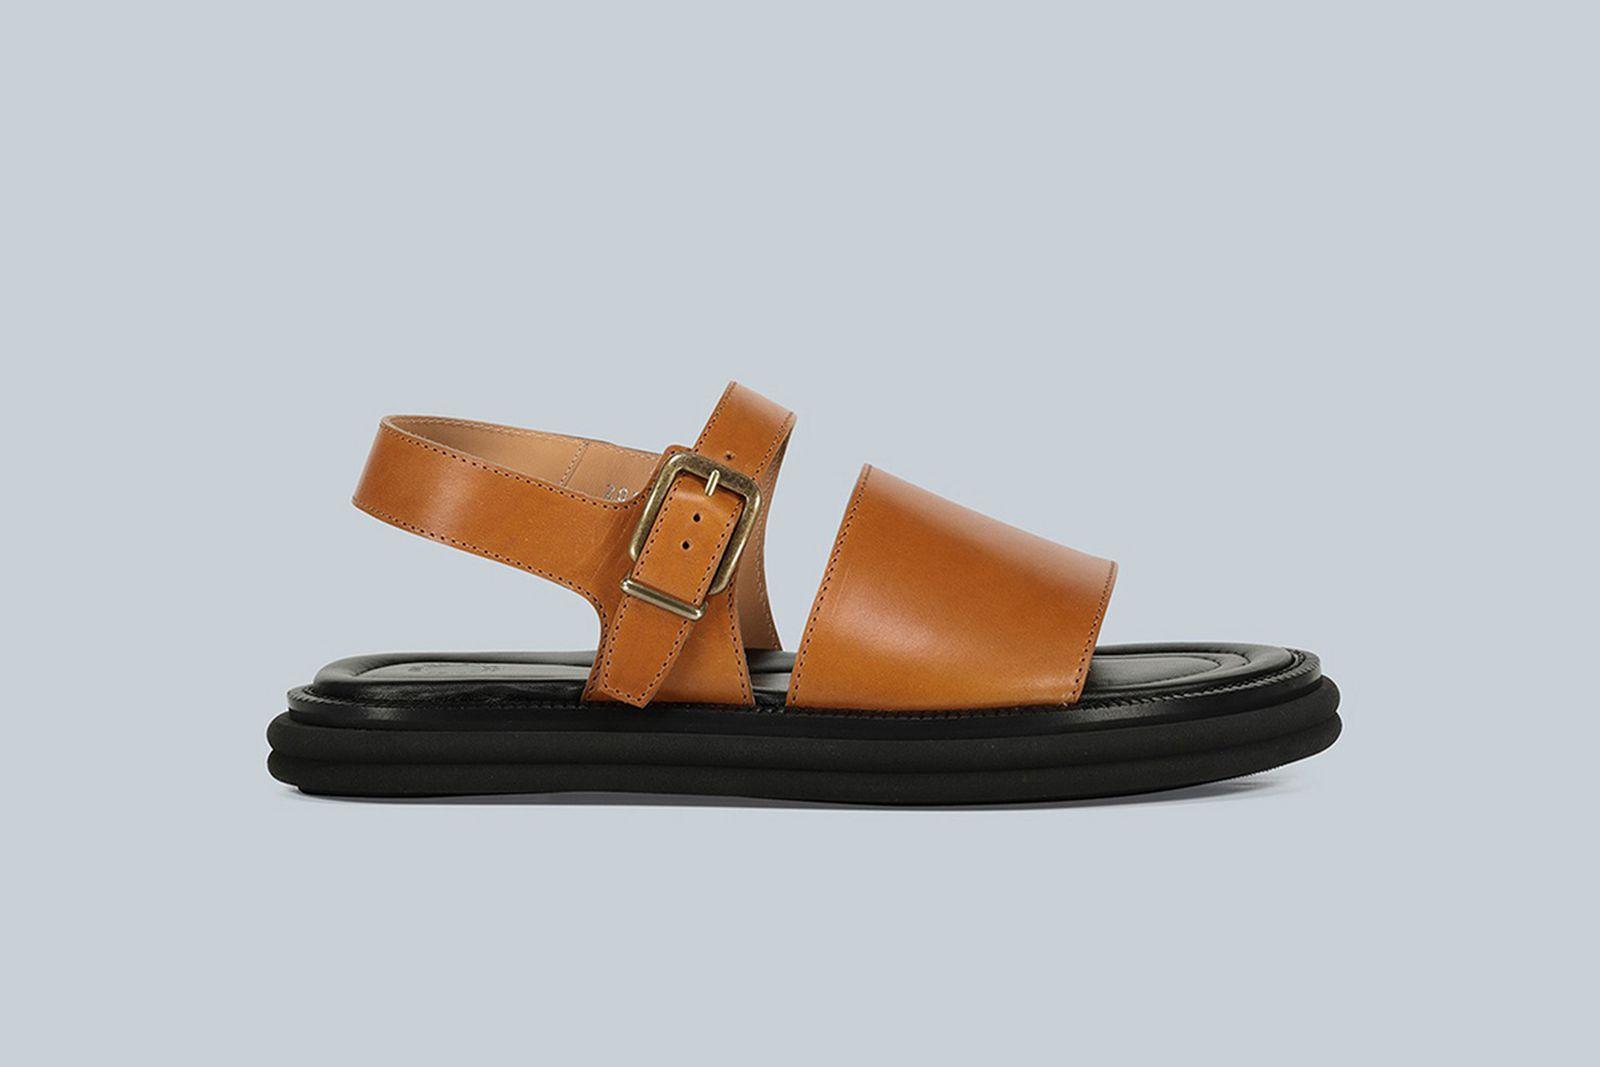 dries-van-noten-sandal-main1